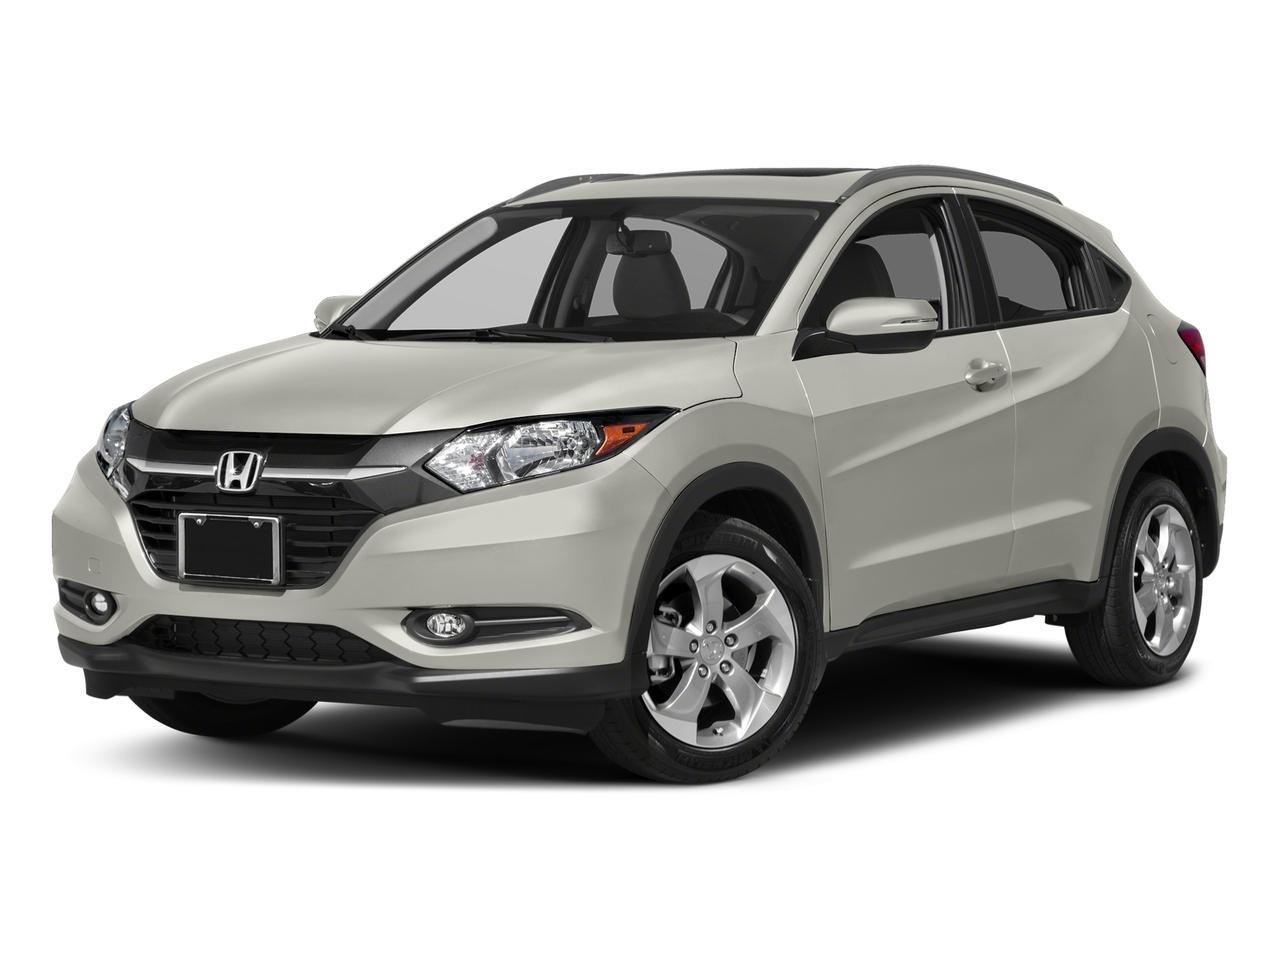 2017 Honda HR-V Vehicle Photo in Kingwood, TX 77339